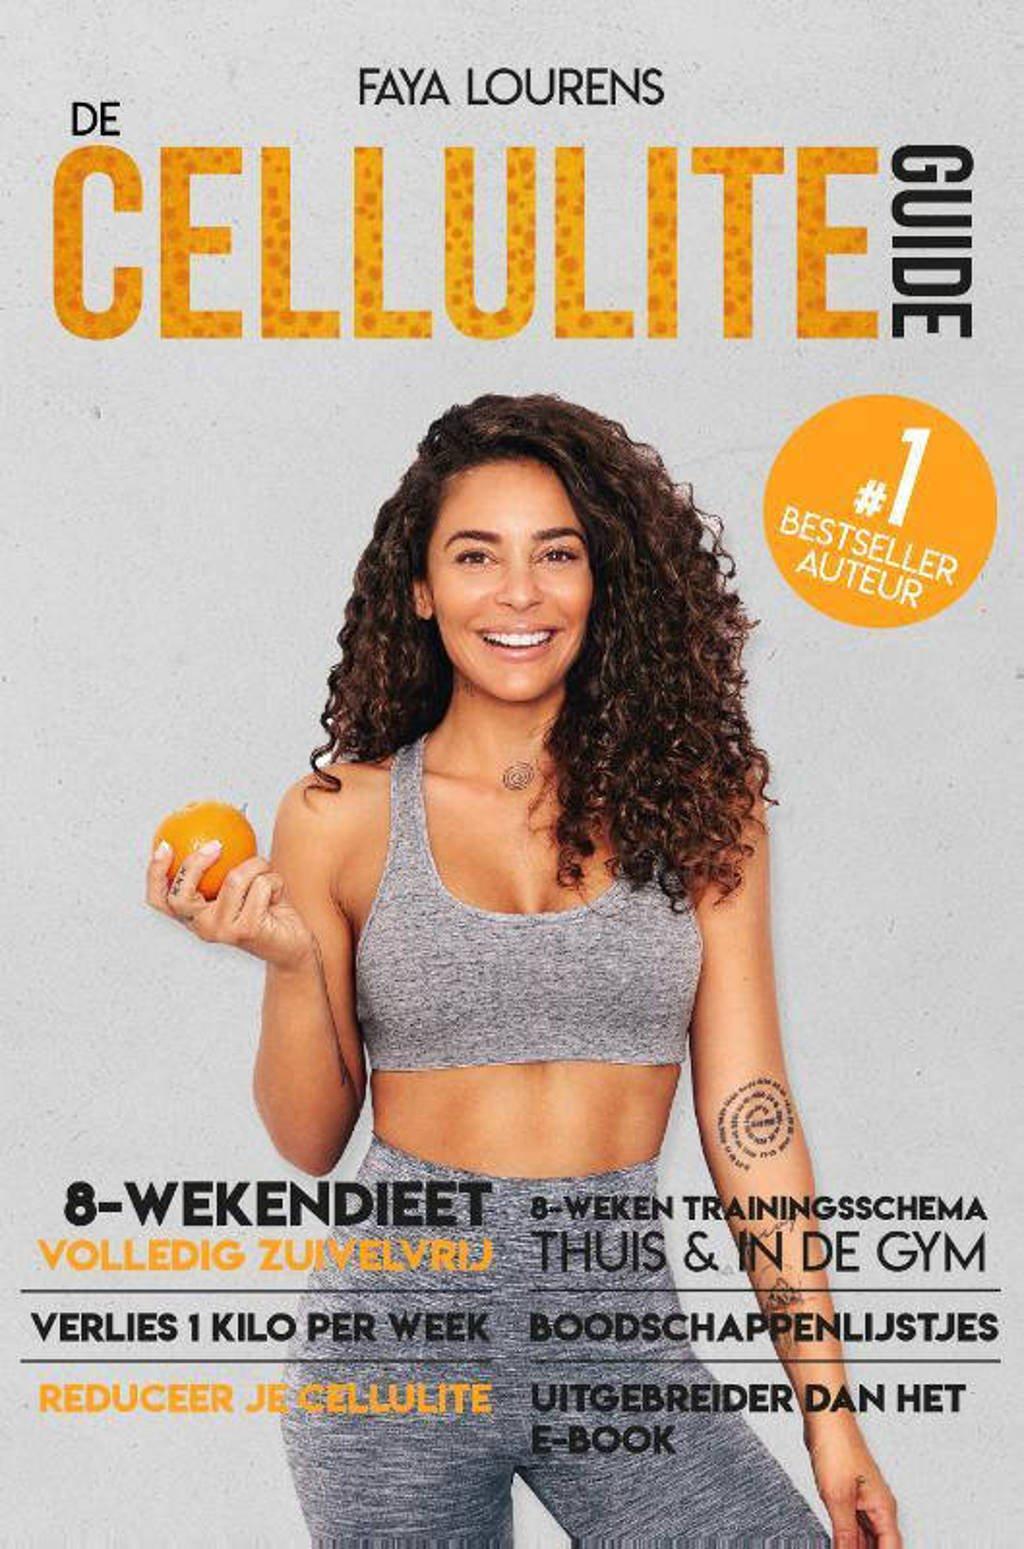 De Cellulite Guide - Faya Lourens